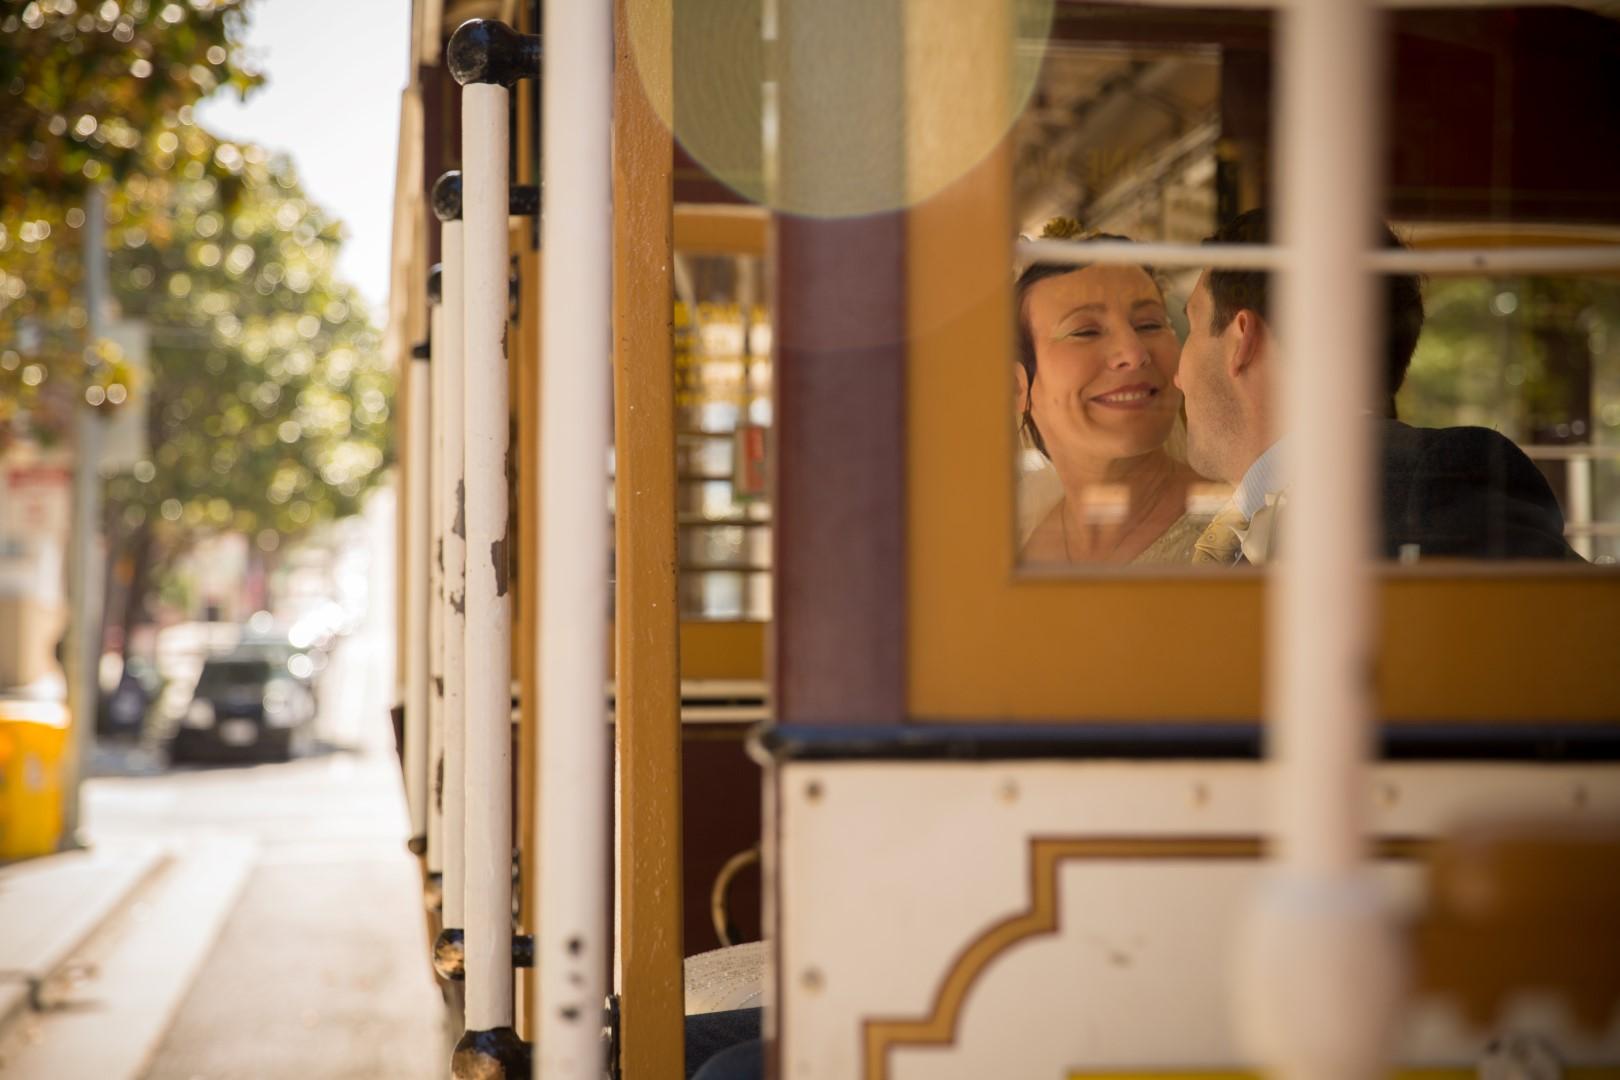 Cable Car Newlyweds :: Award-winning Wedding Photography by Michael Thomas